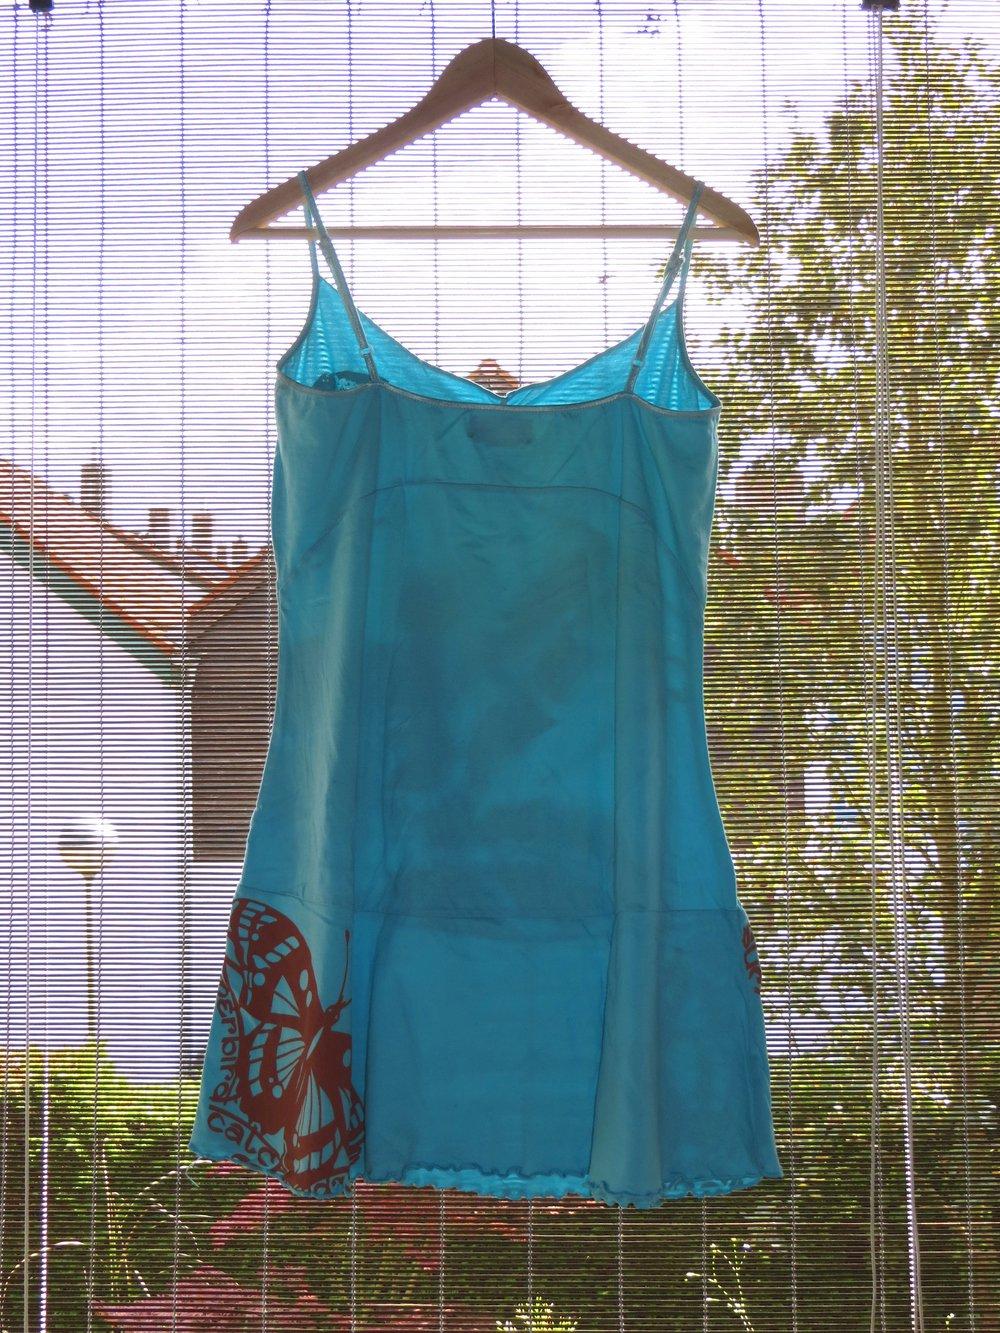 bpx 86 hellblaues strandkleid kleid f r den sommer mit print bedruckt schmetterling bunt. Black Bedroom Furniture Sets. Home Design Ideas